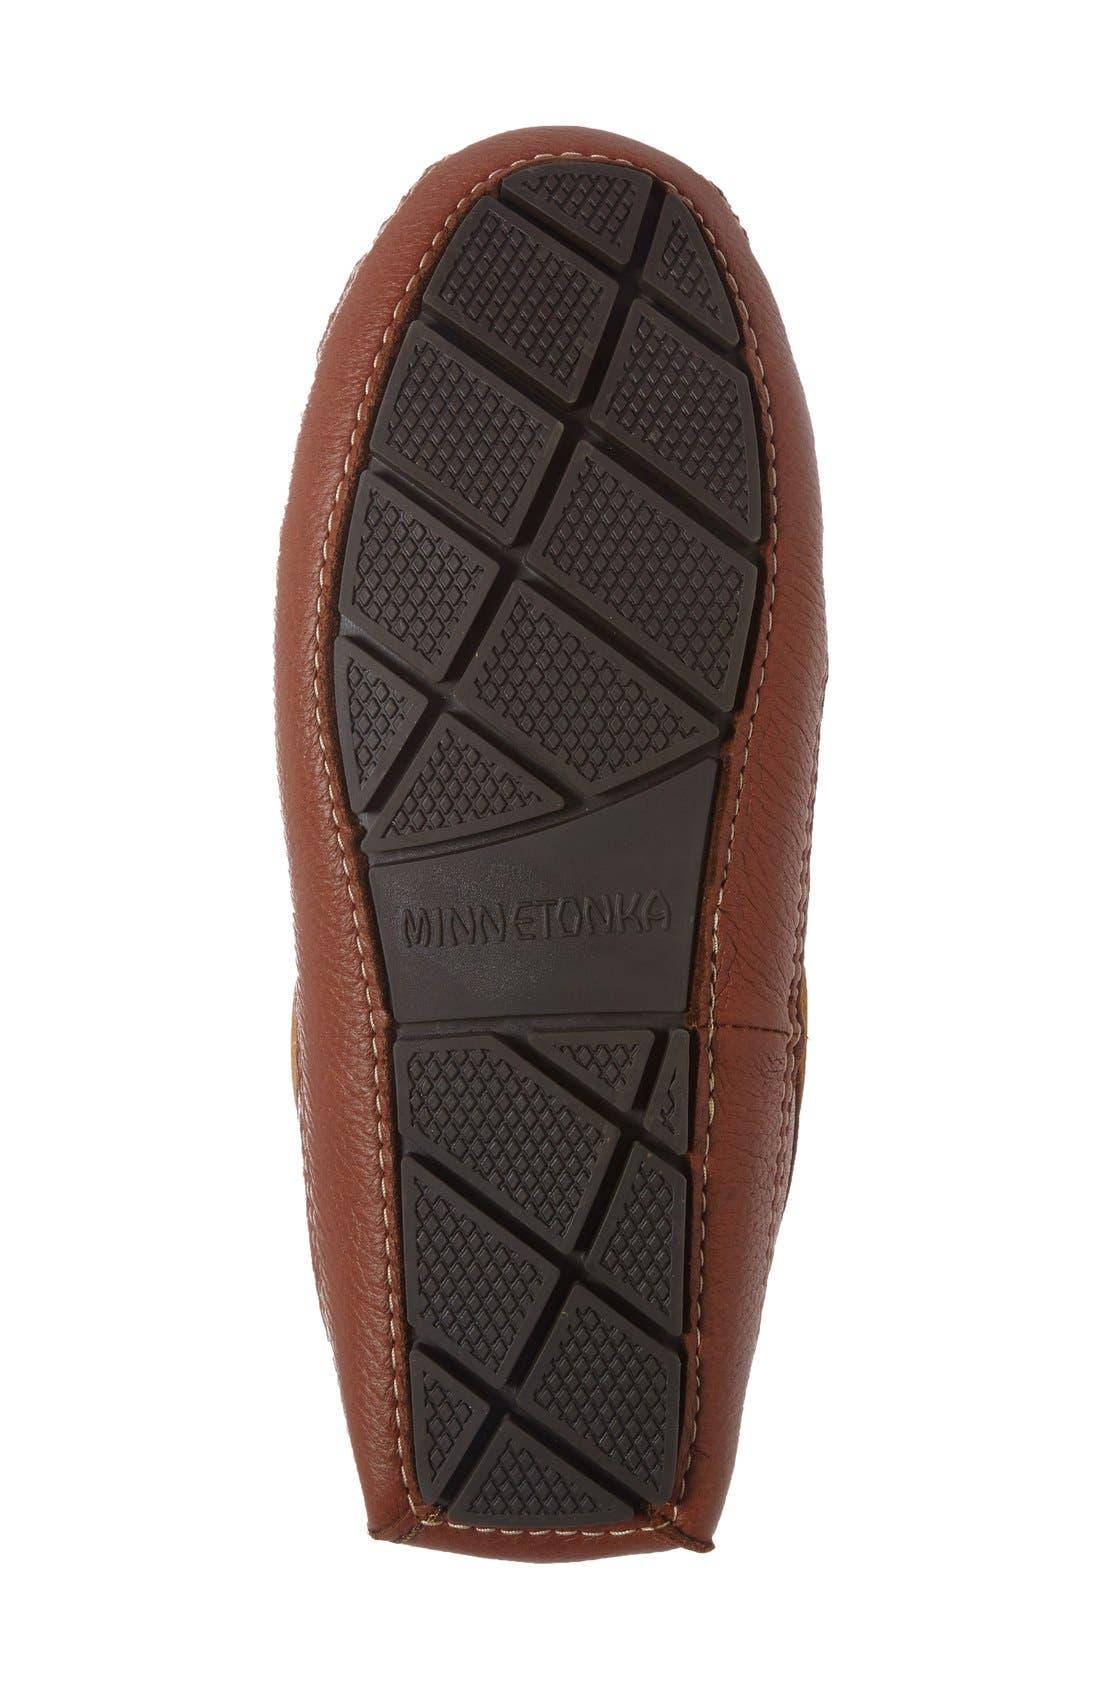 Genuine Shearling Lined Leather Slipper,                             Alternate thumbnail 4, color,                             CARMEL